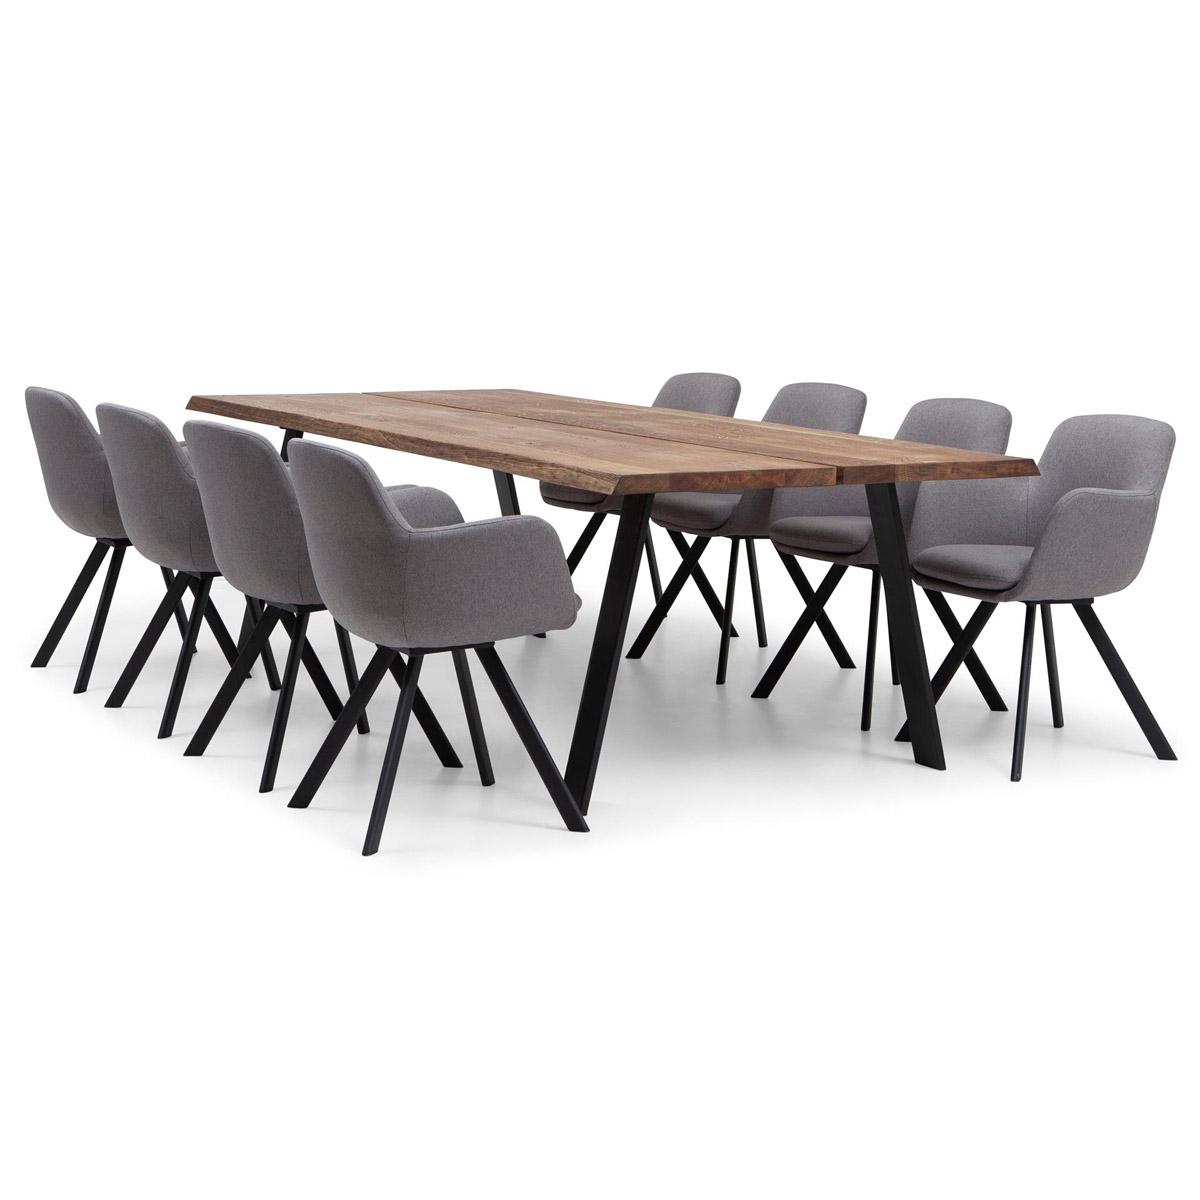 Westville bord stol grå